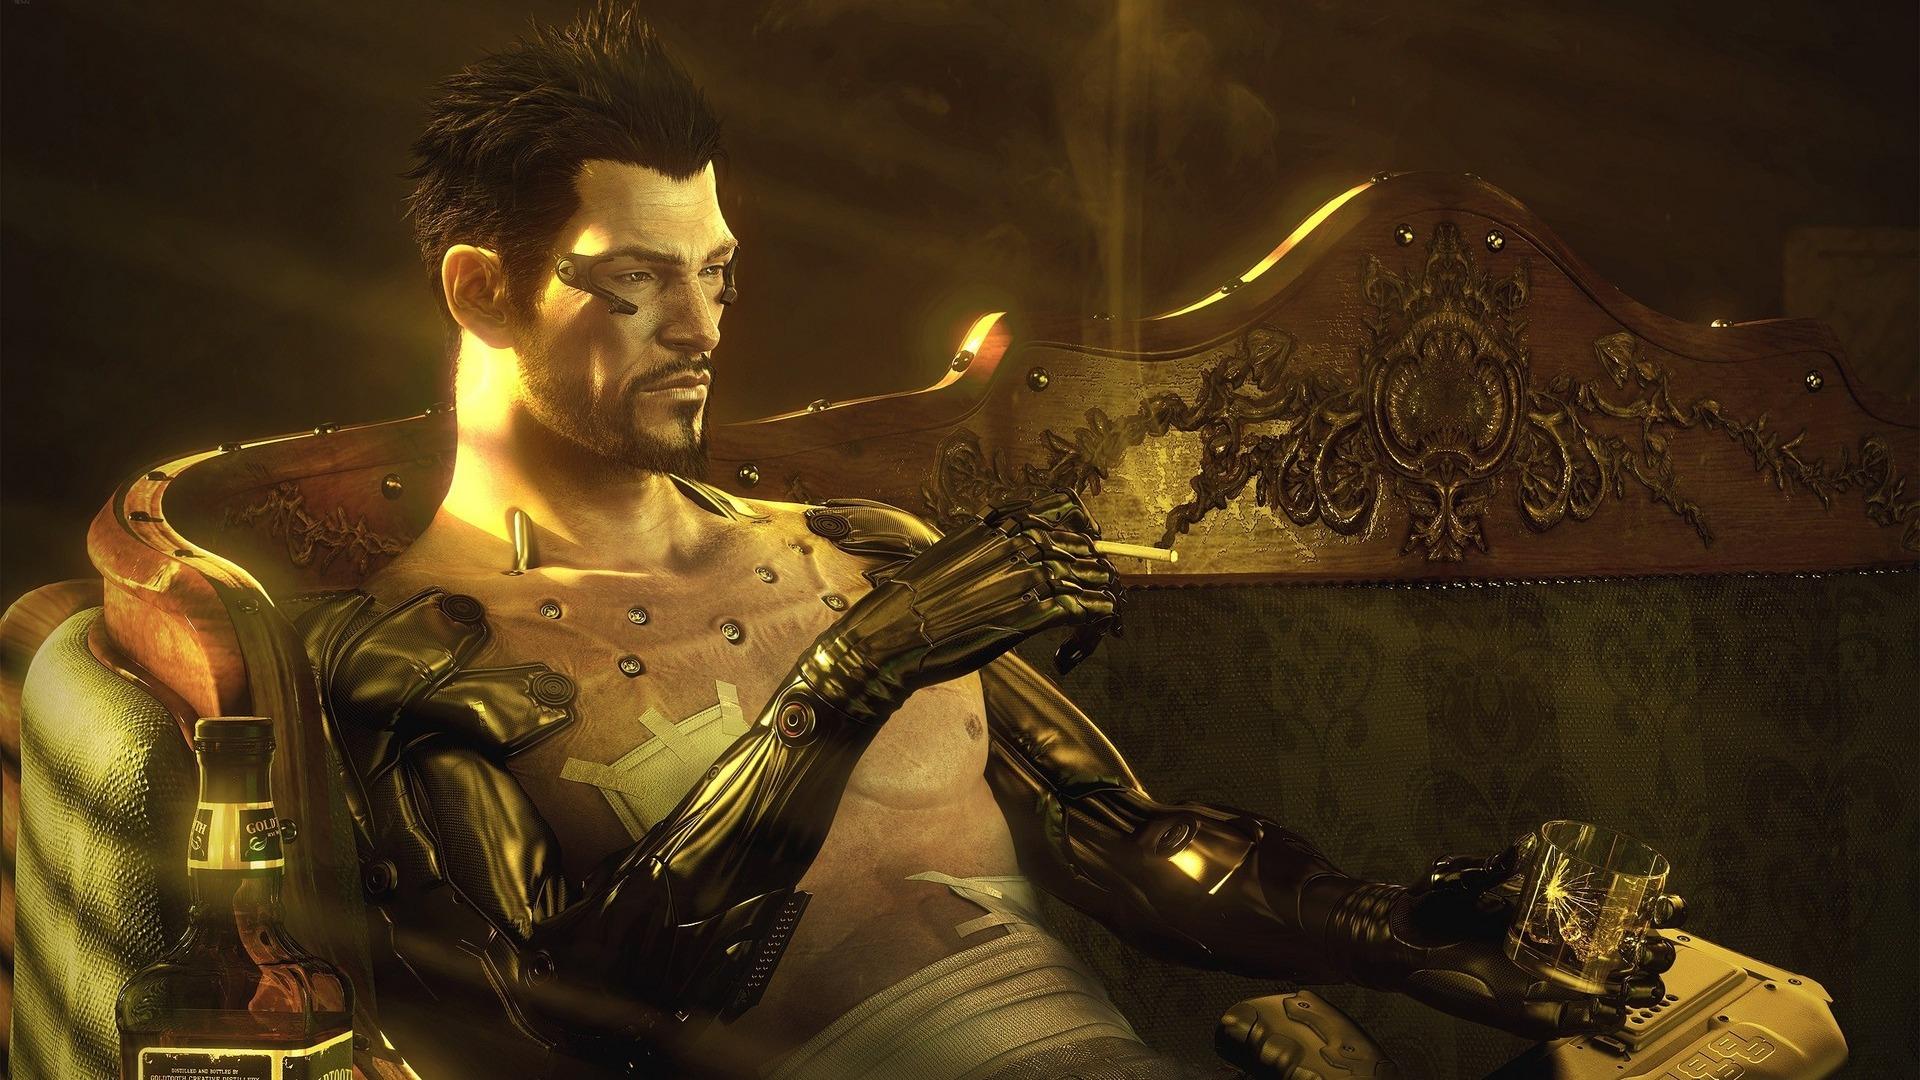 Deus Ex Human Revolution HD wallpapers 9   1920x1080 Wallpaper 1920x1080